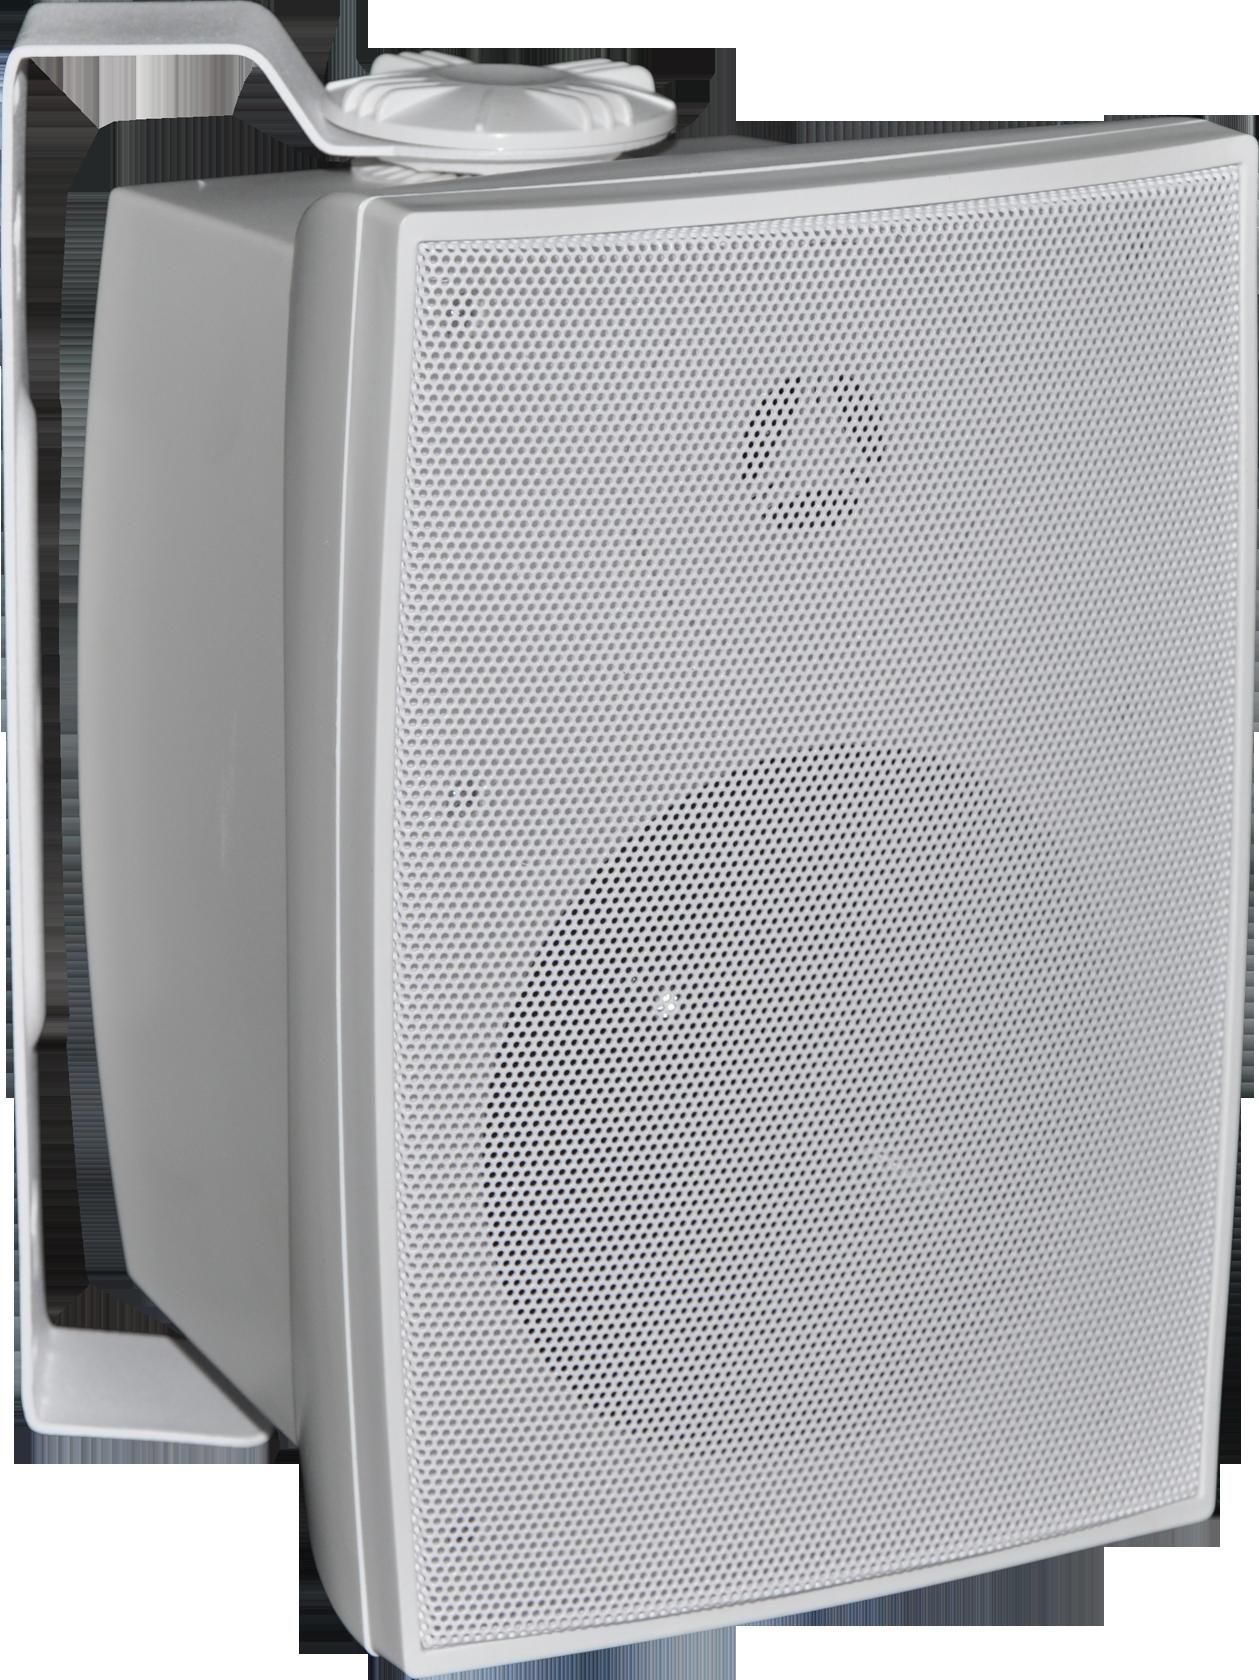 Bocina Bluetooth WiPLAY351